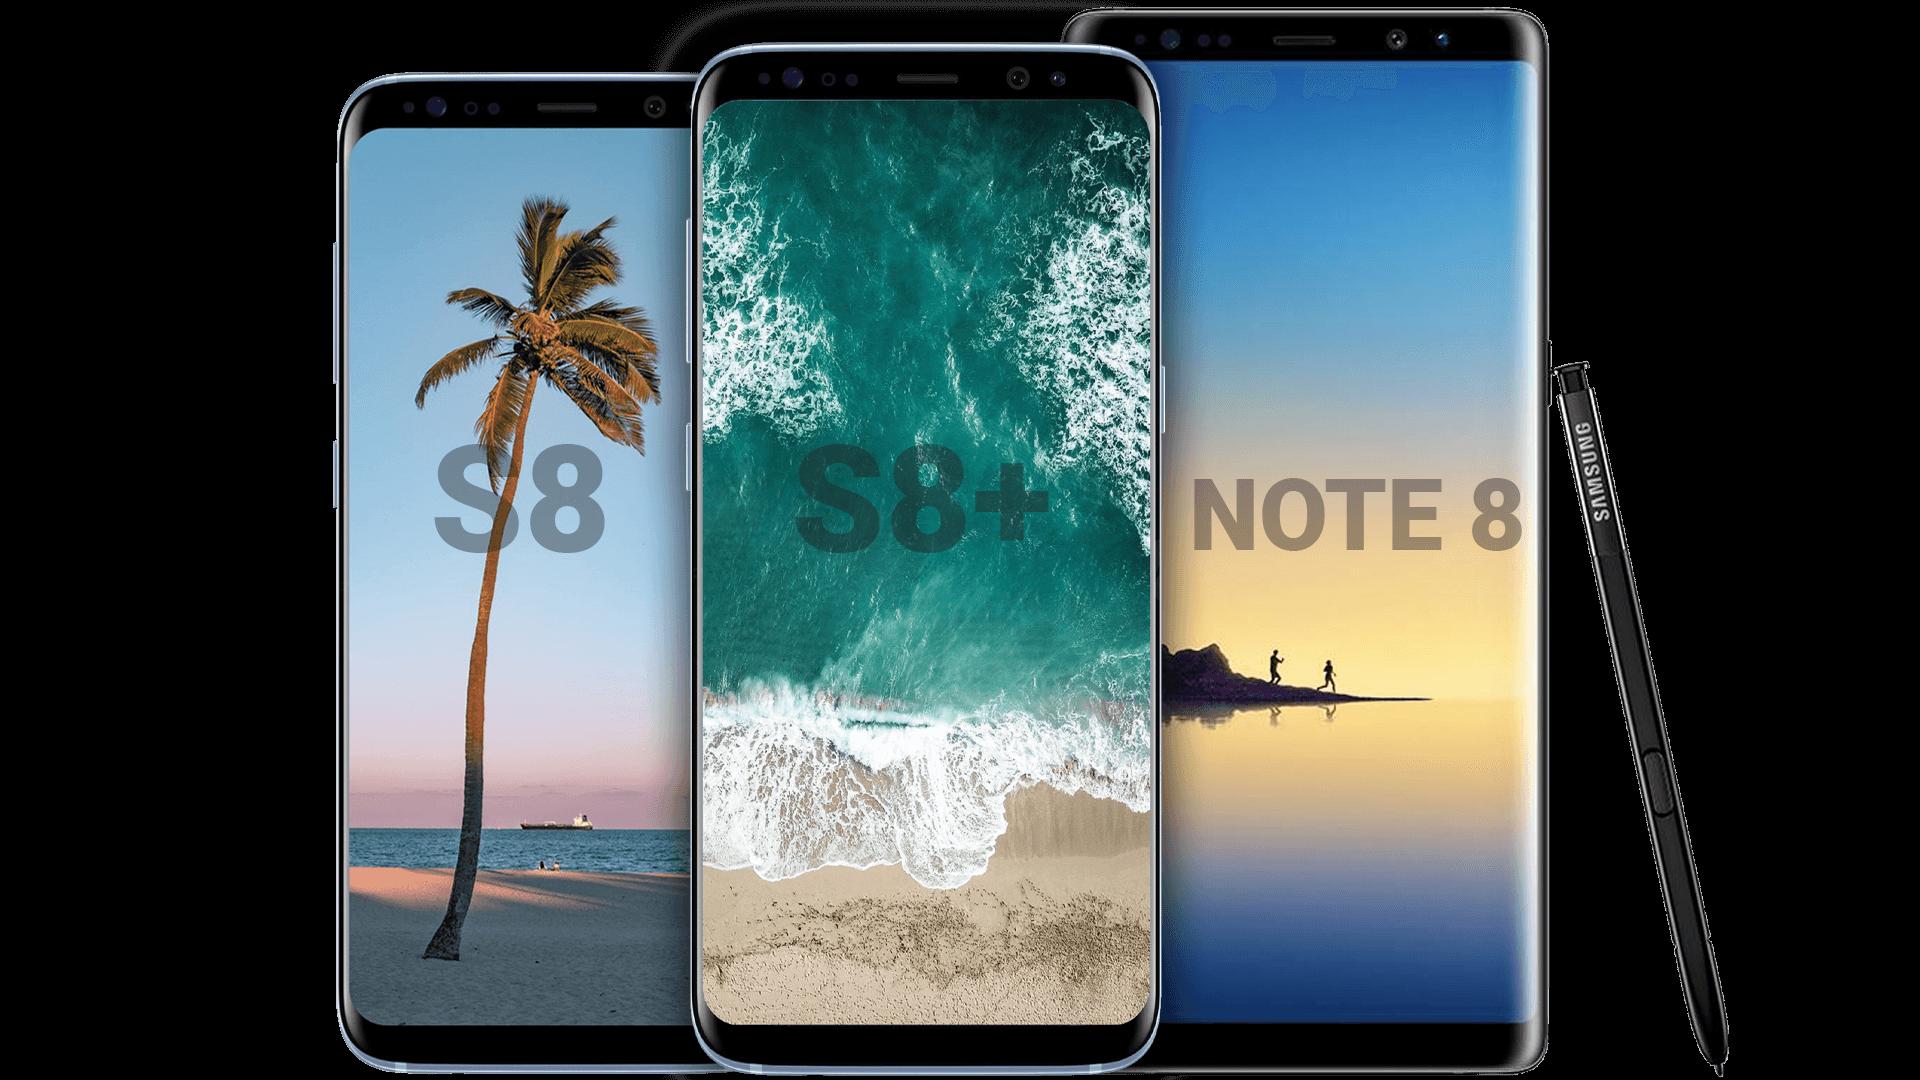 S8 Promo Phones Lineup